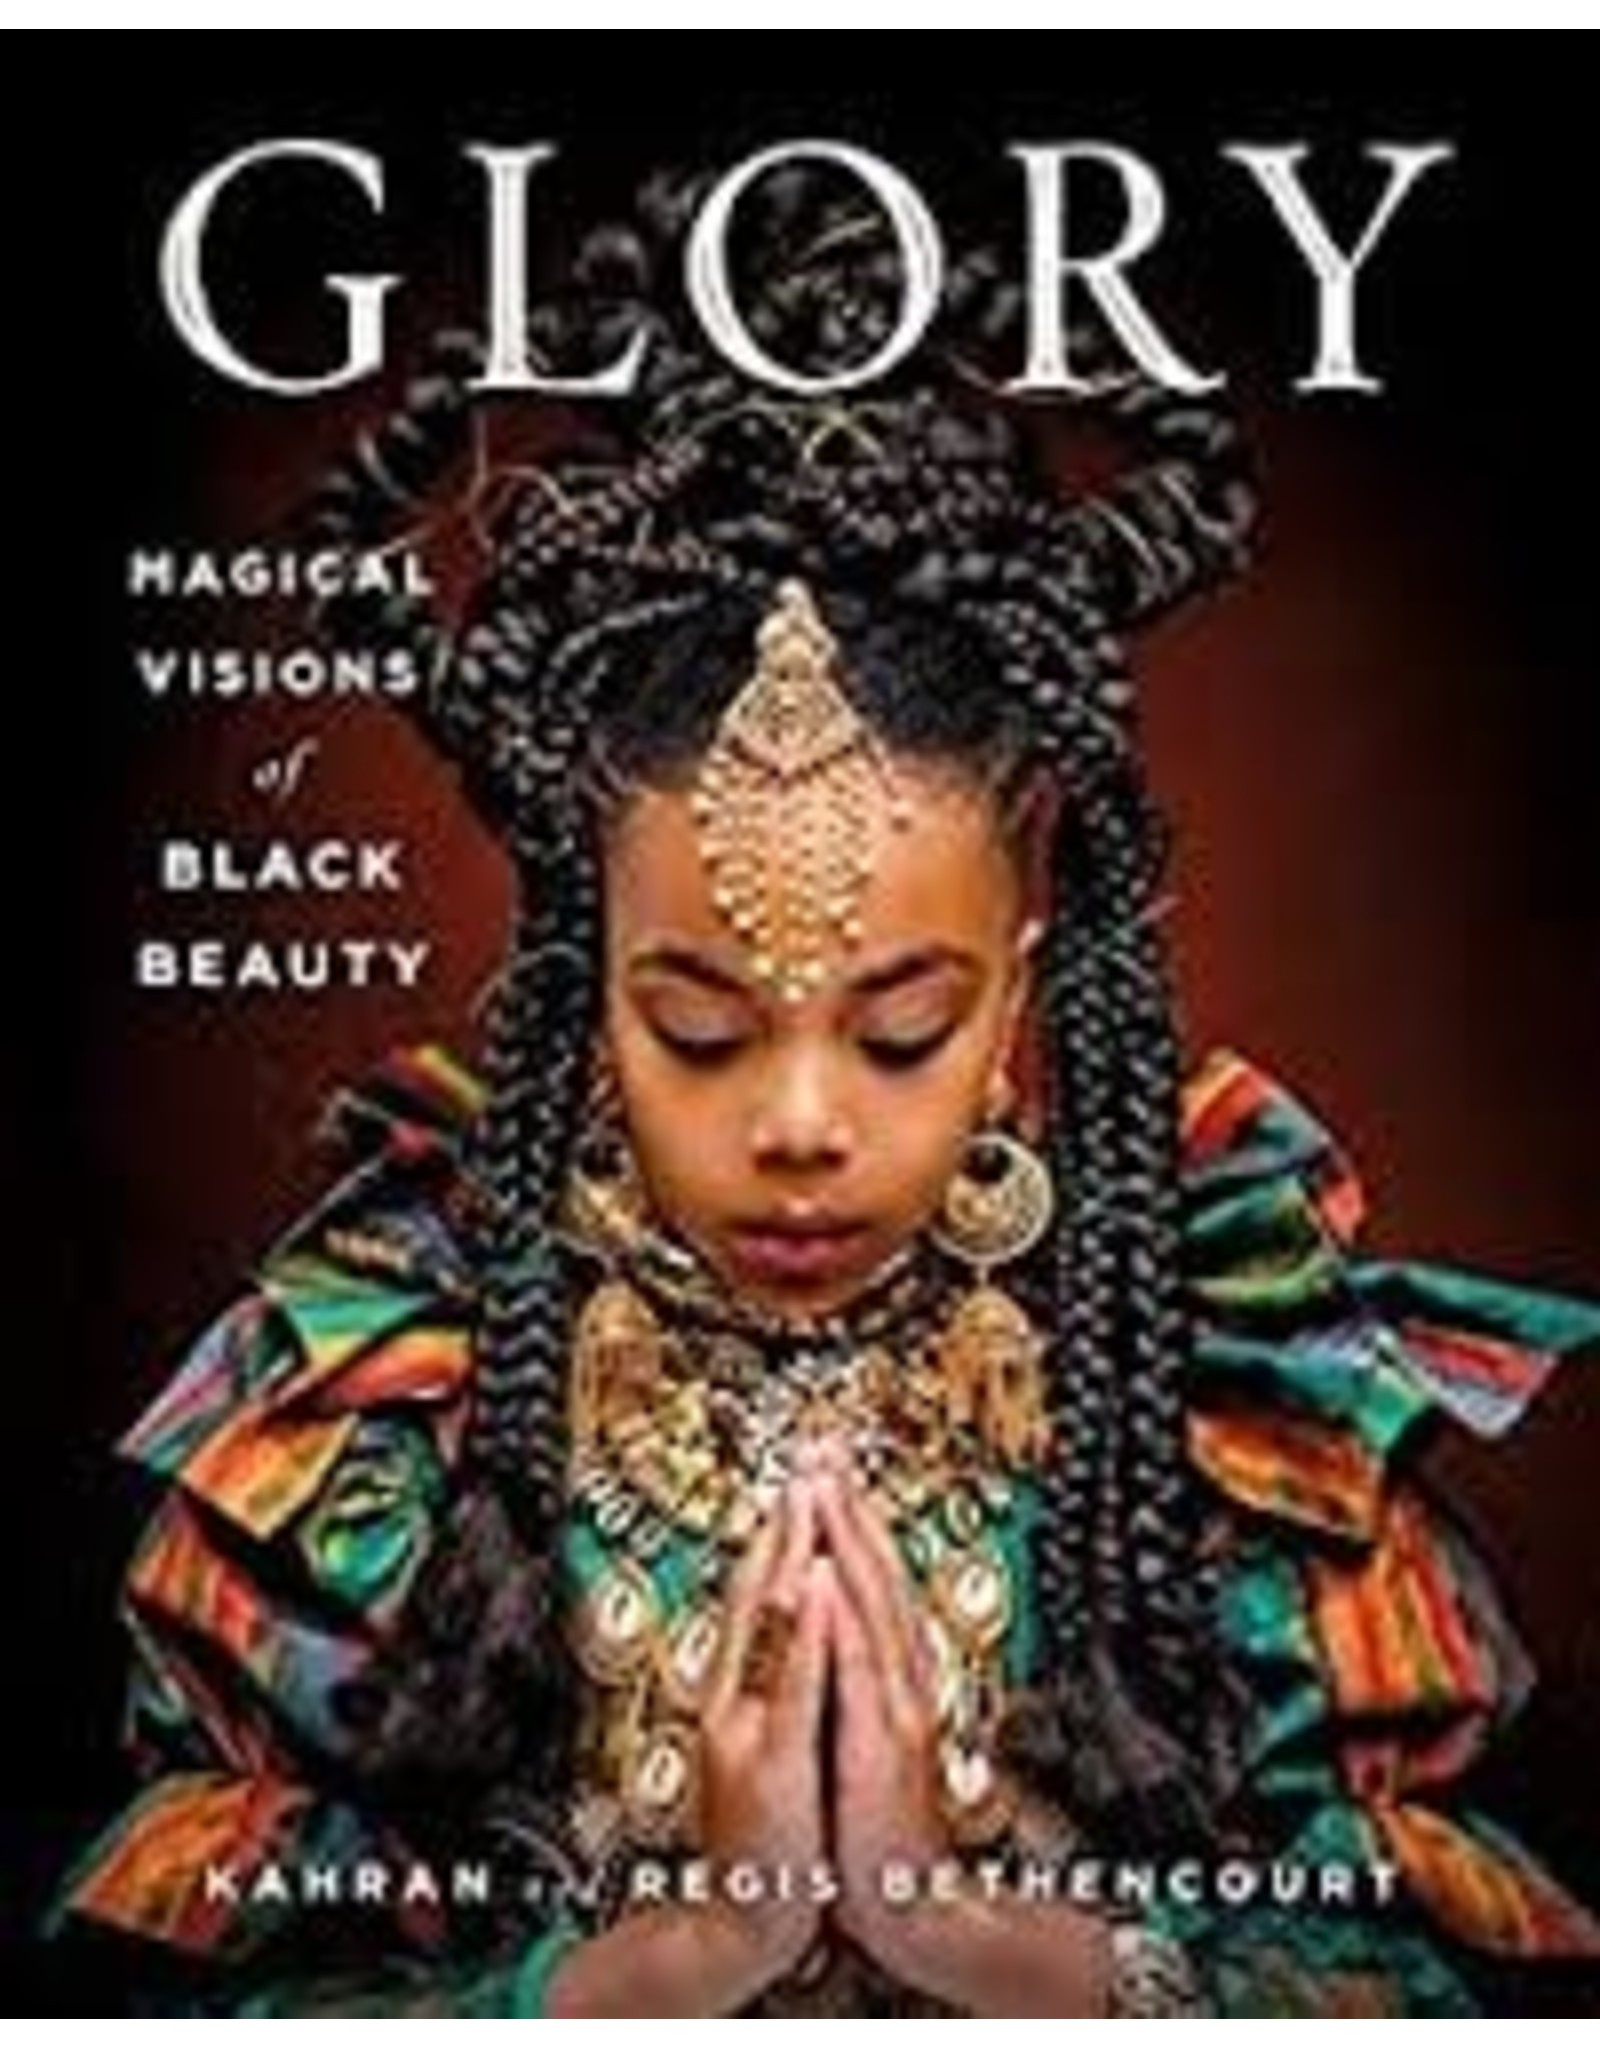 Bag Glory: Magical Visions of Black Beauty by Kahran and Regis Bethencourt (Holiday Catalog) (BlackFriday 2020)